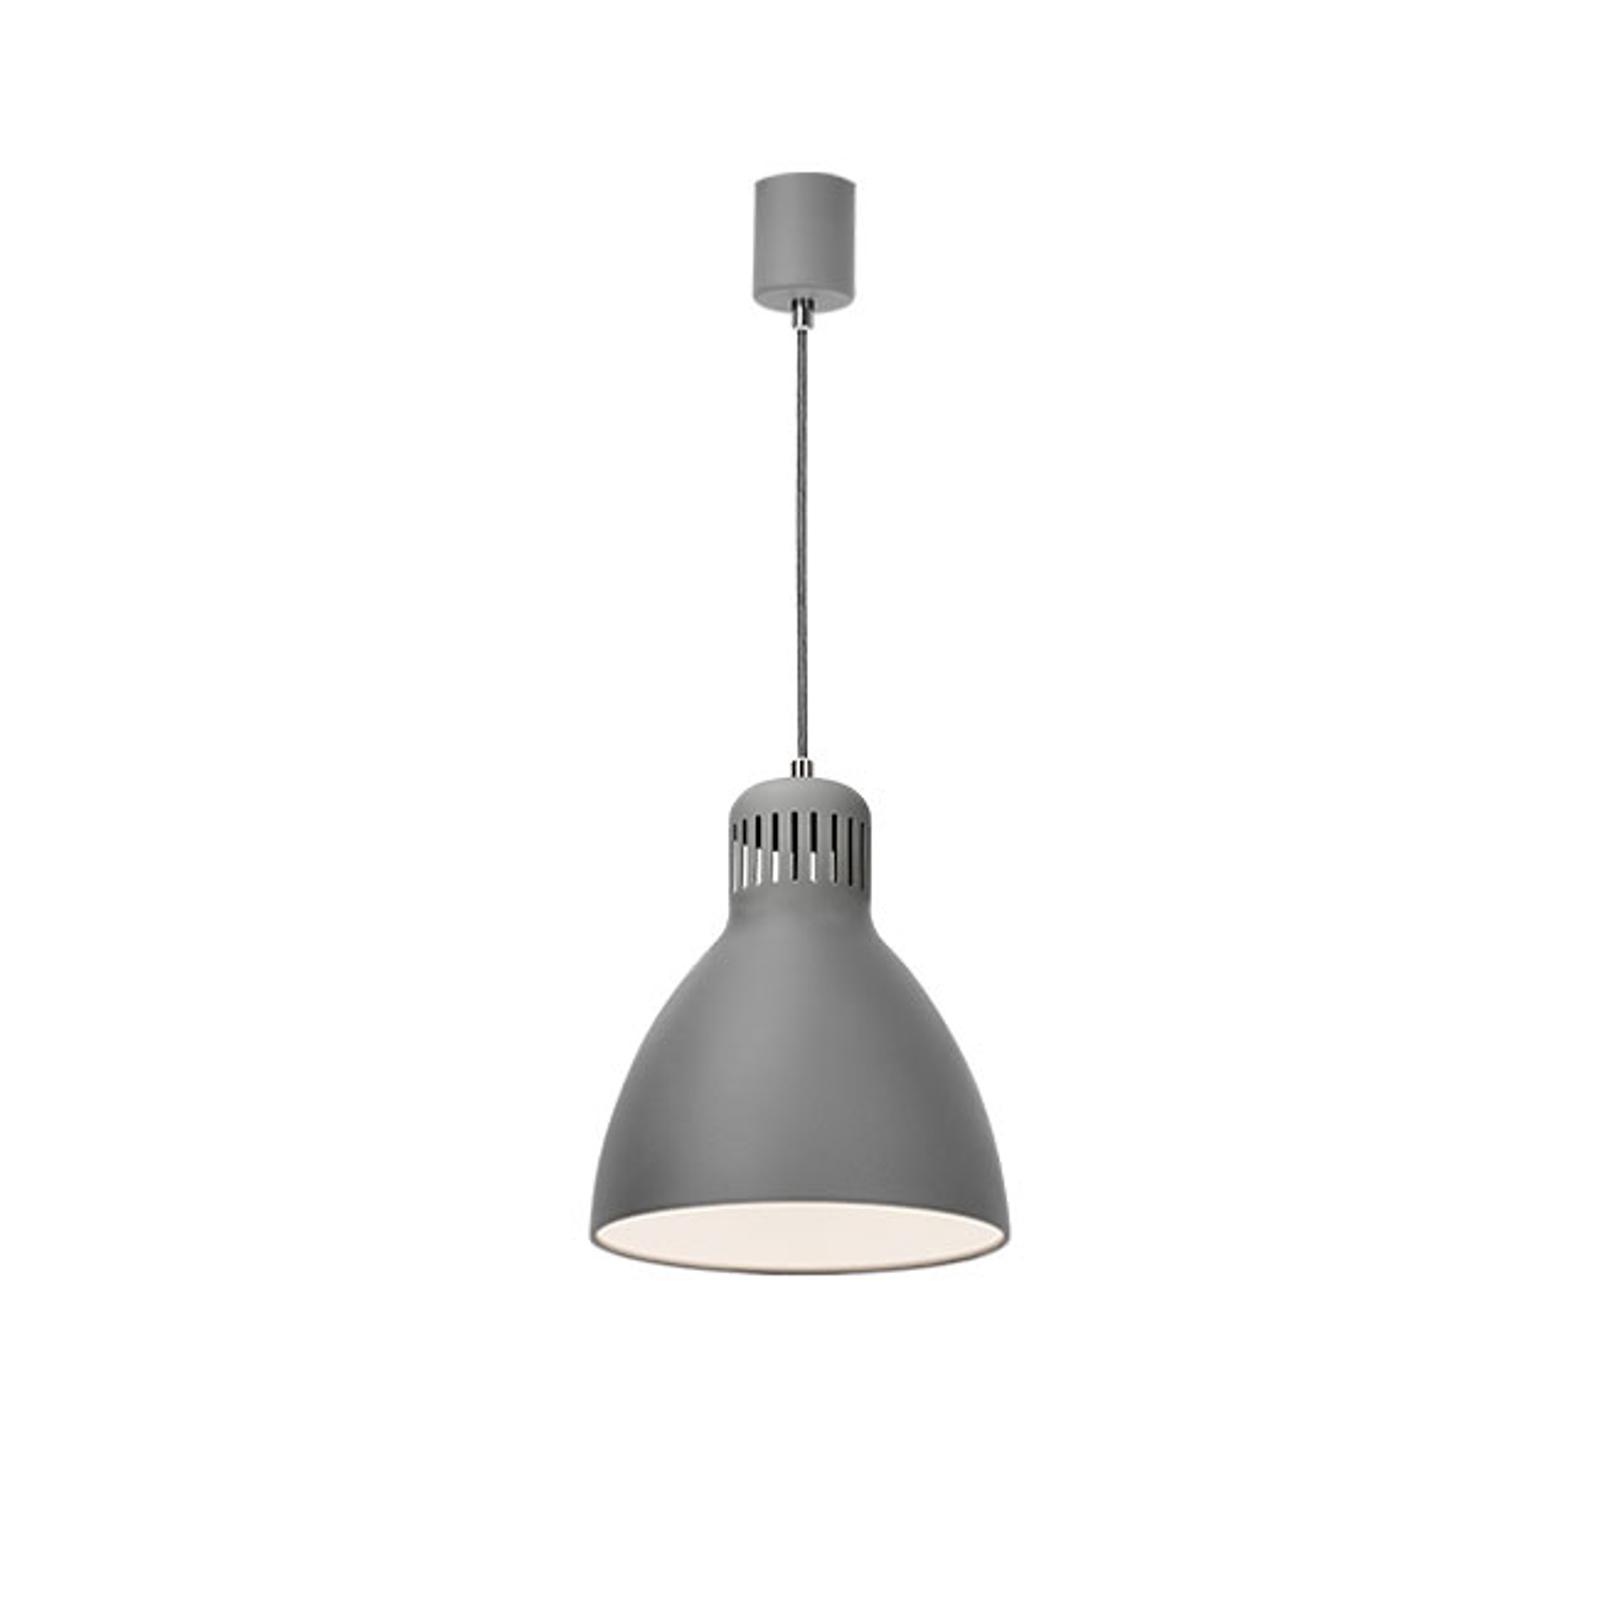 Lampa wisząca LED L-1, 4000 K, szara